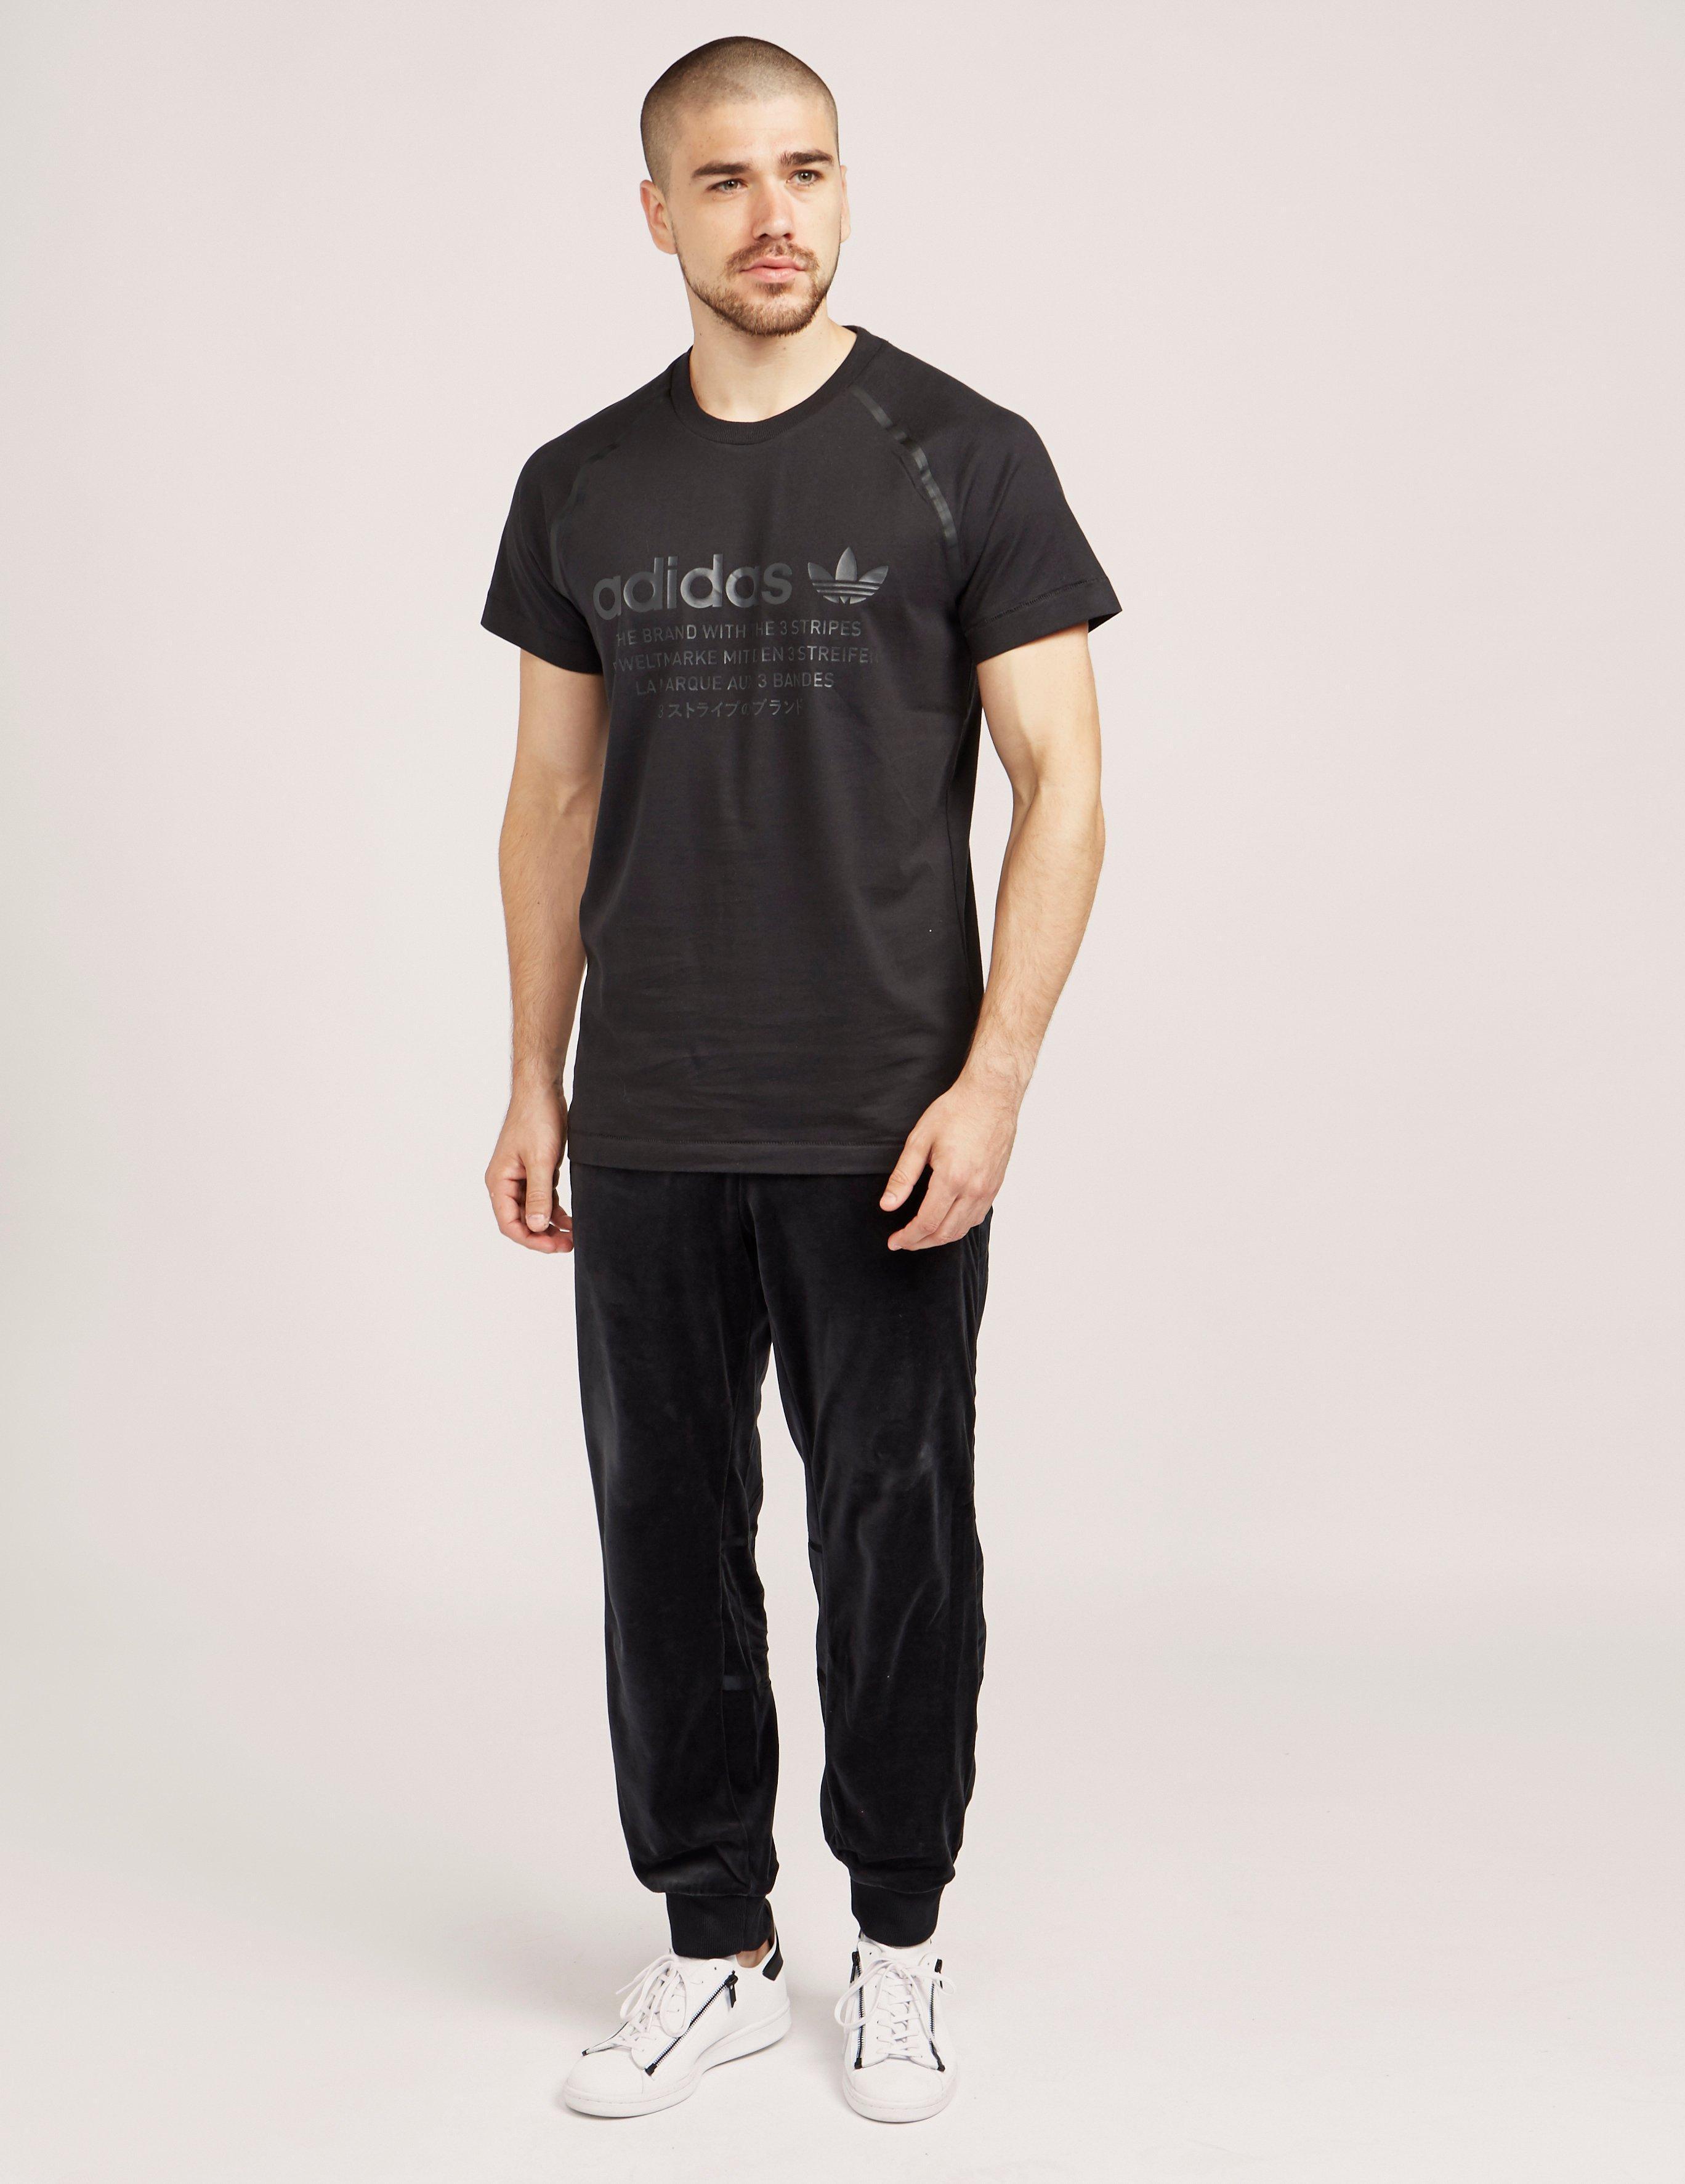 44b1315a adidas Originals Nmd Logo Short Sleeve T-shirt Black in Black for Men - Lyst